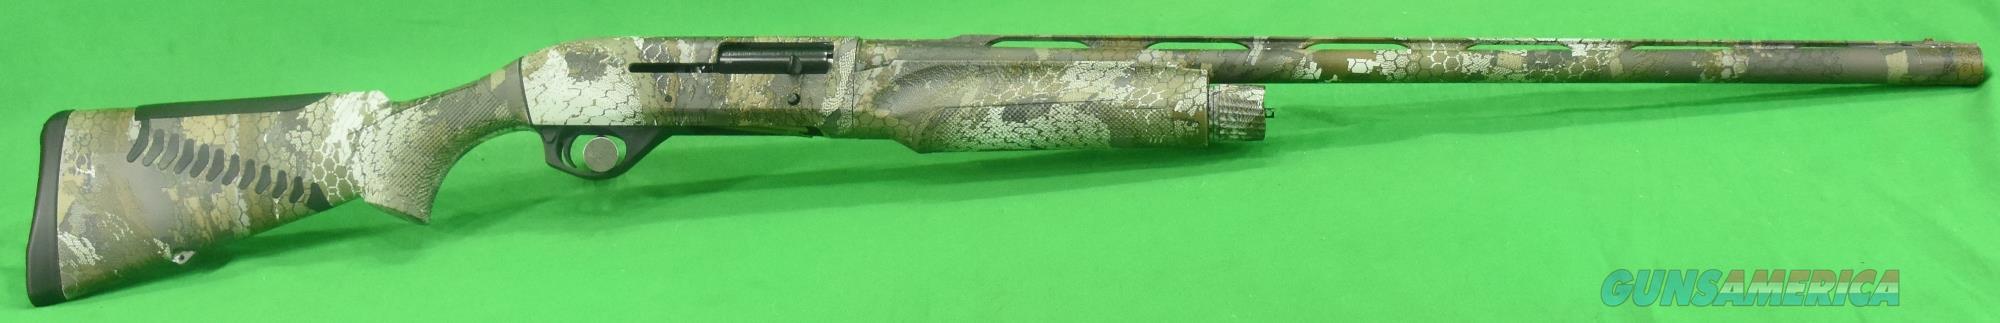 11147 Benelli M2 Field Optifade Timber 12 Ga 28-3In  Guns > Shotguns > Benelli Shotguns > Sporting